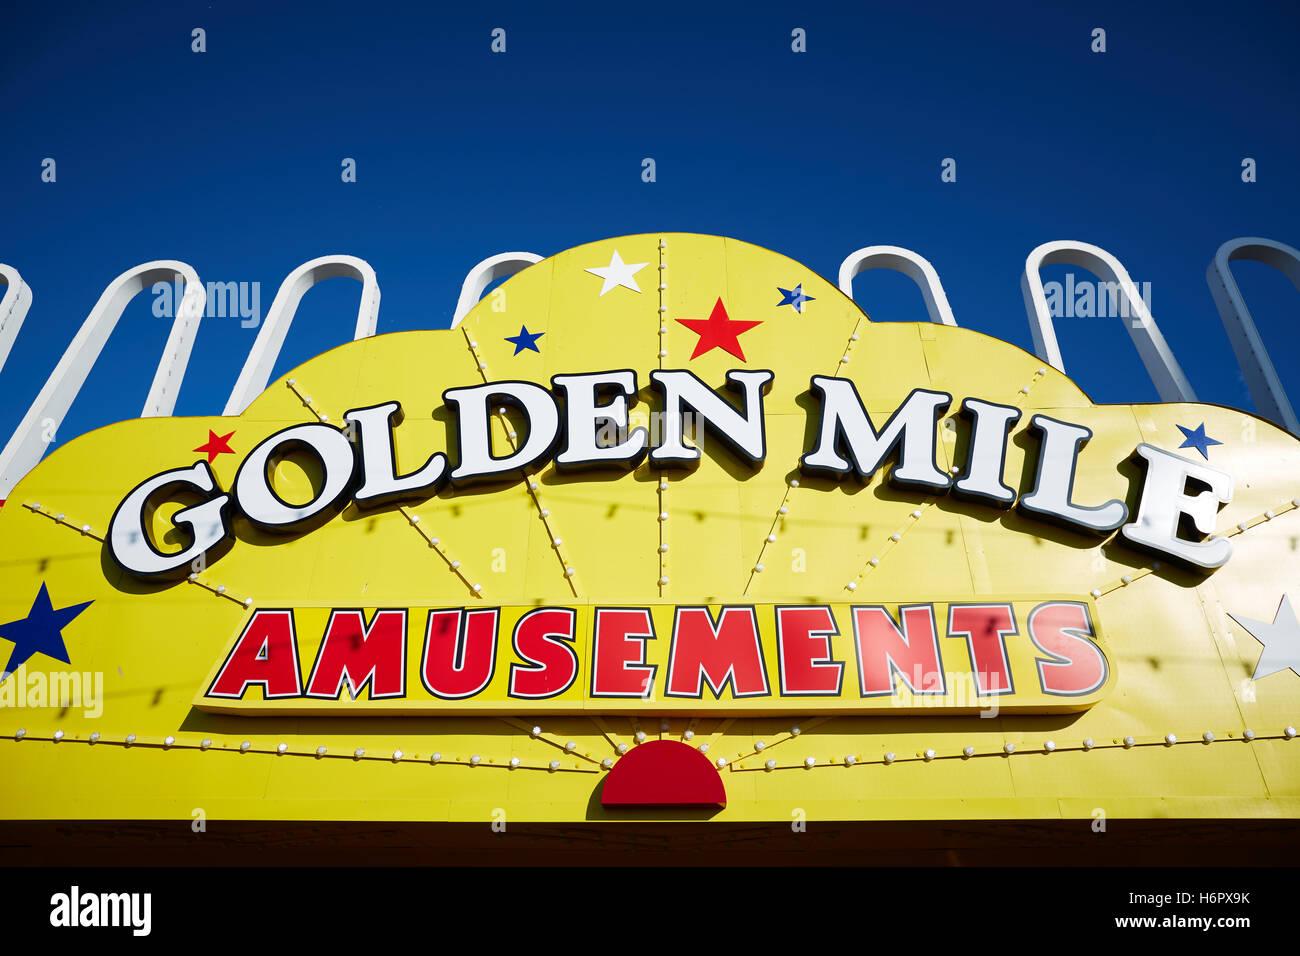 Blackpool Golden Mile Sign Amusement   Holiday sea side town resort Lancashire tourist attractions amusements arcade - Stock Image